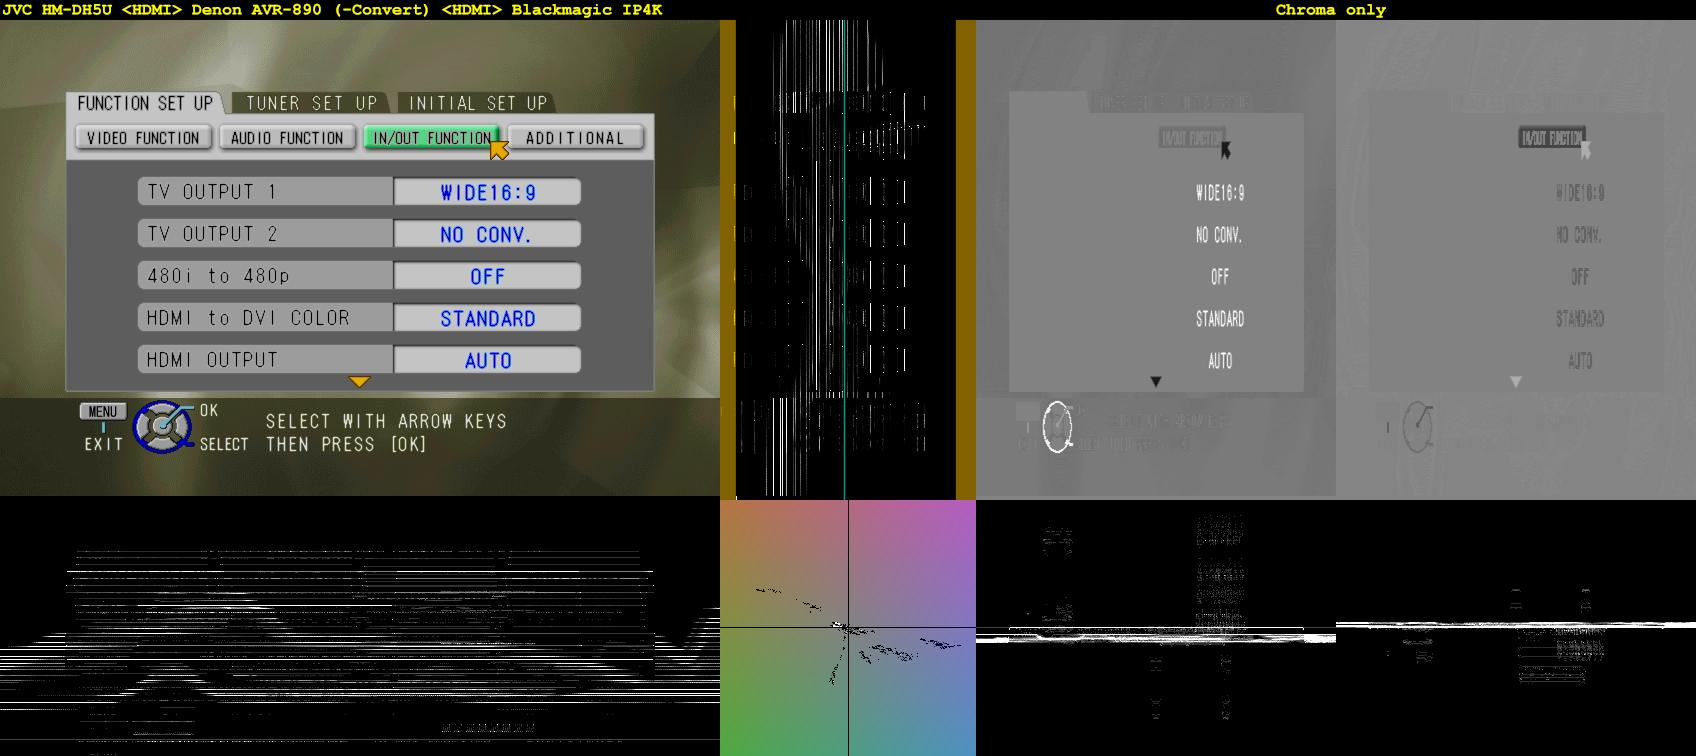 Click image for larger version  Name:Menu - JVC HM-DH5U =HDMI= Denon AVR-890, -Convert =HDMI= IP4K.png Views:3255 Size:396.0 KB ID:35274